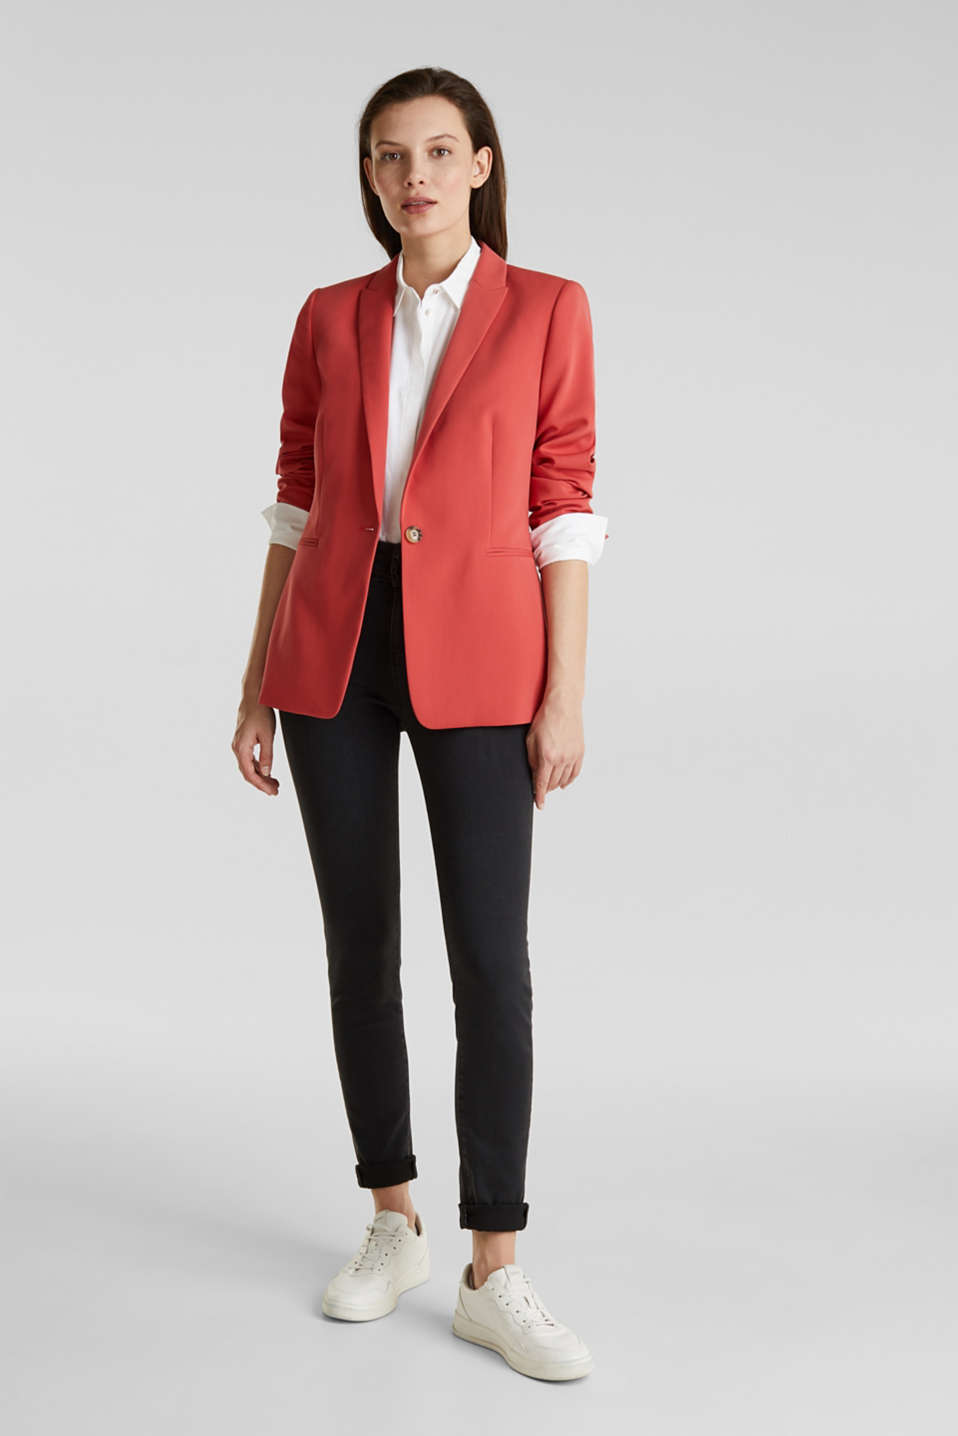 SOFT TEXTURE Mix + Match stretch blazer